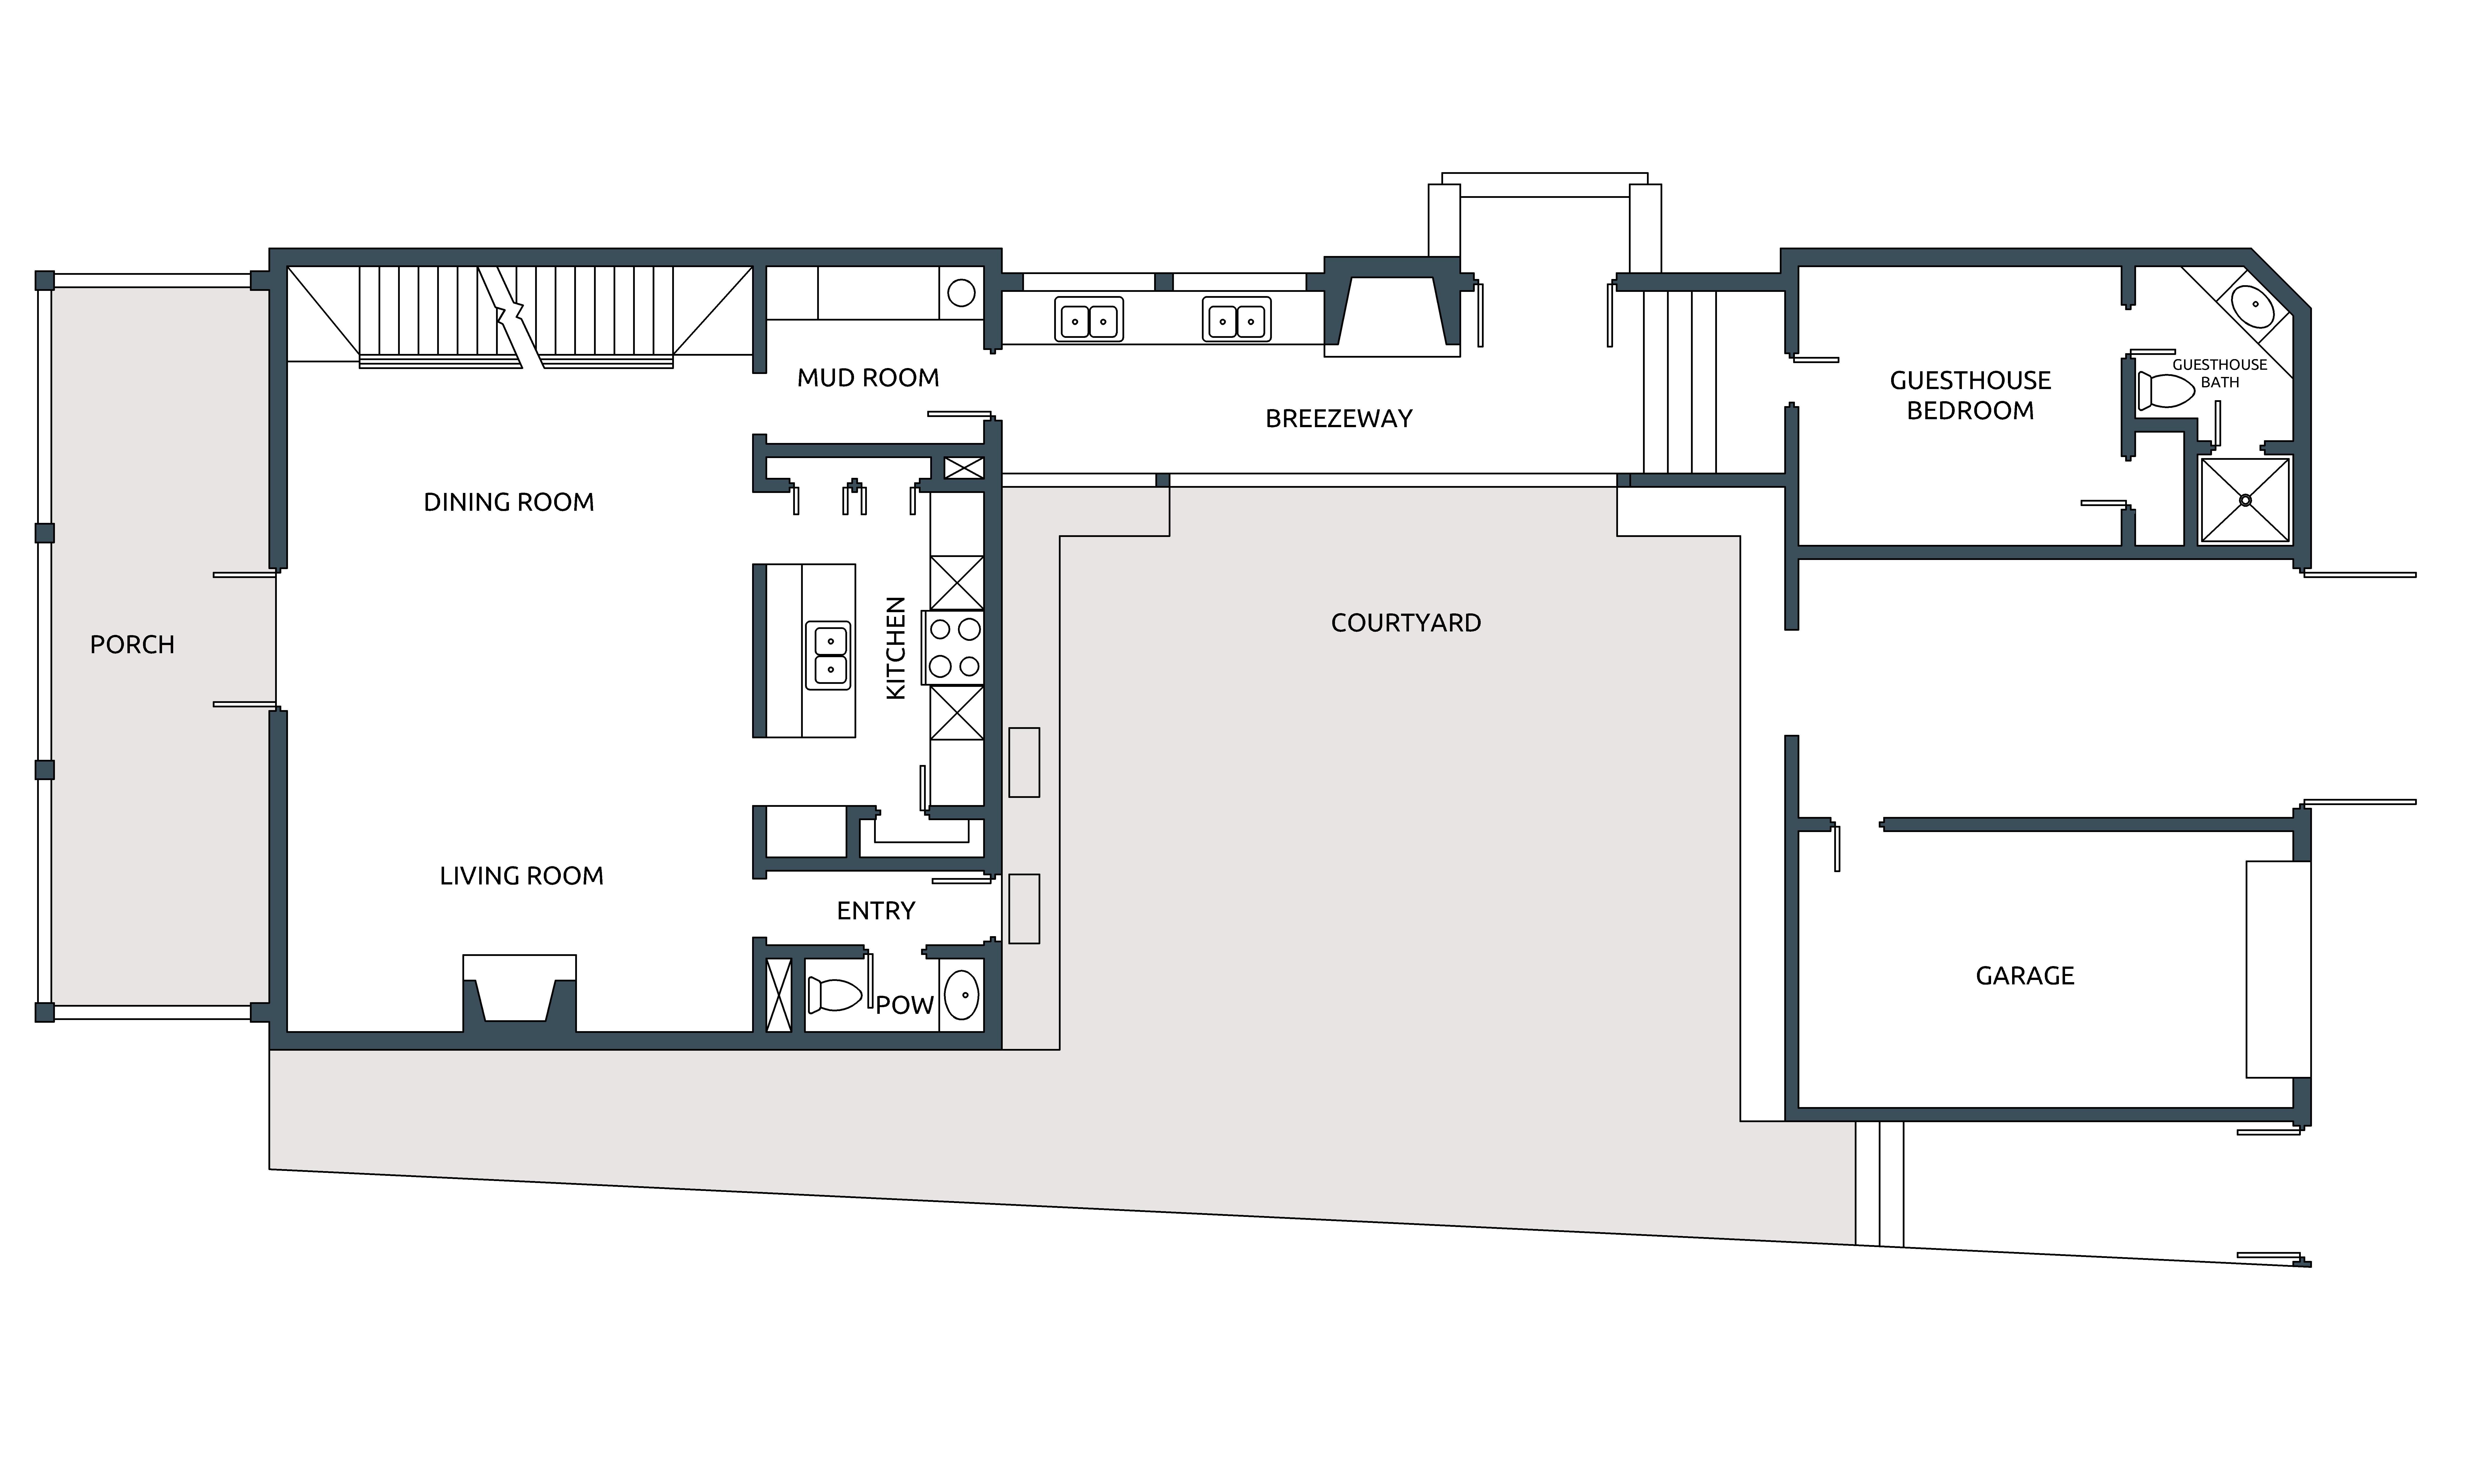 House Plans Coastal: coastal living floor plans